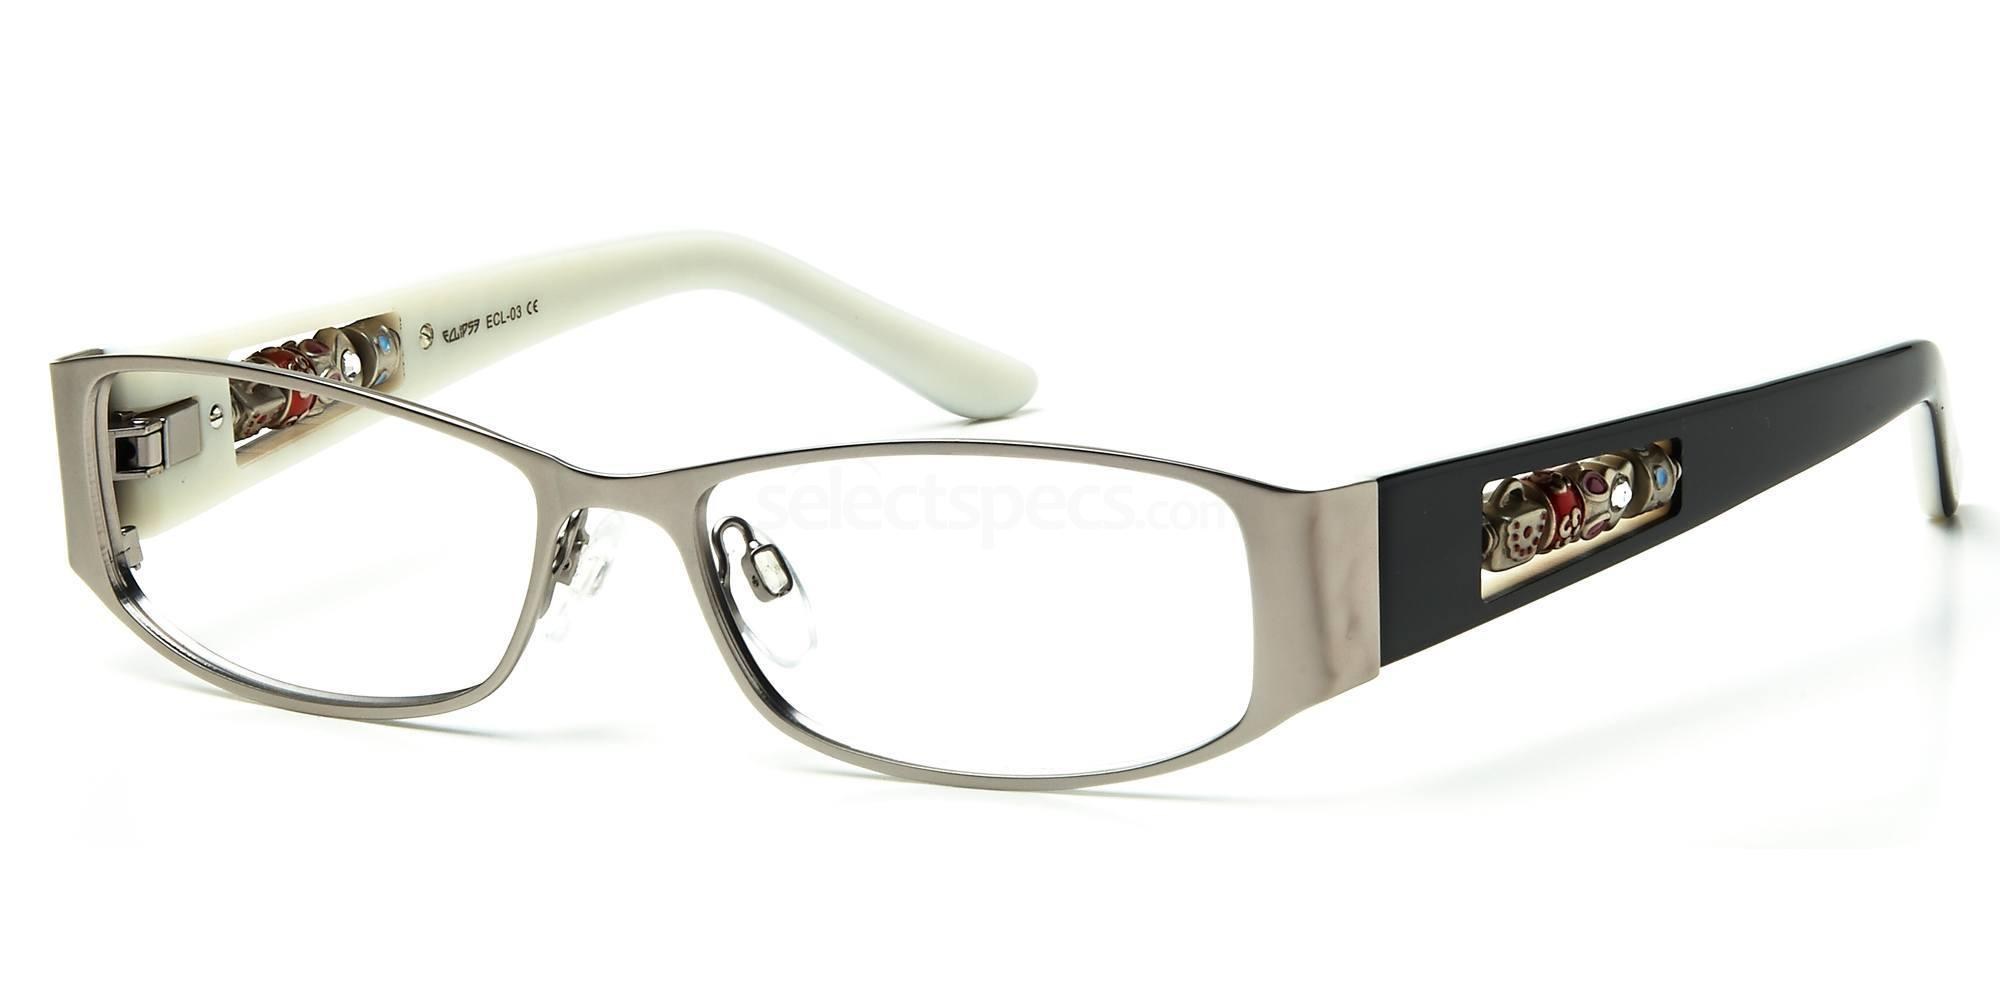 C1 ECL03 Glasses, Eclipse